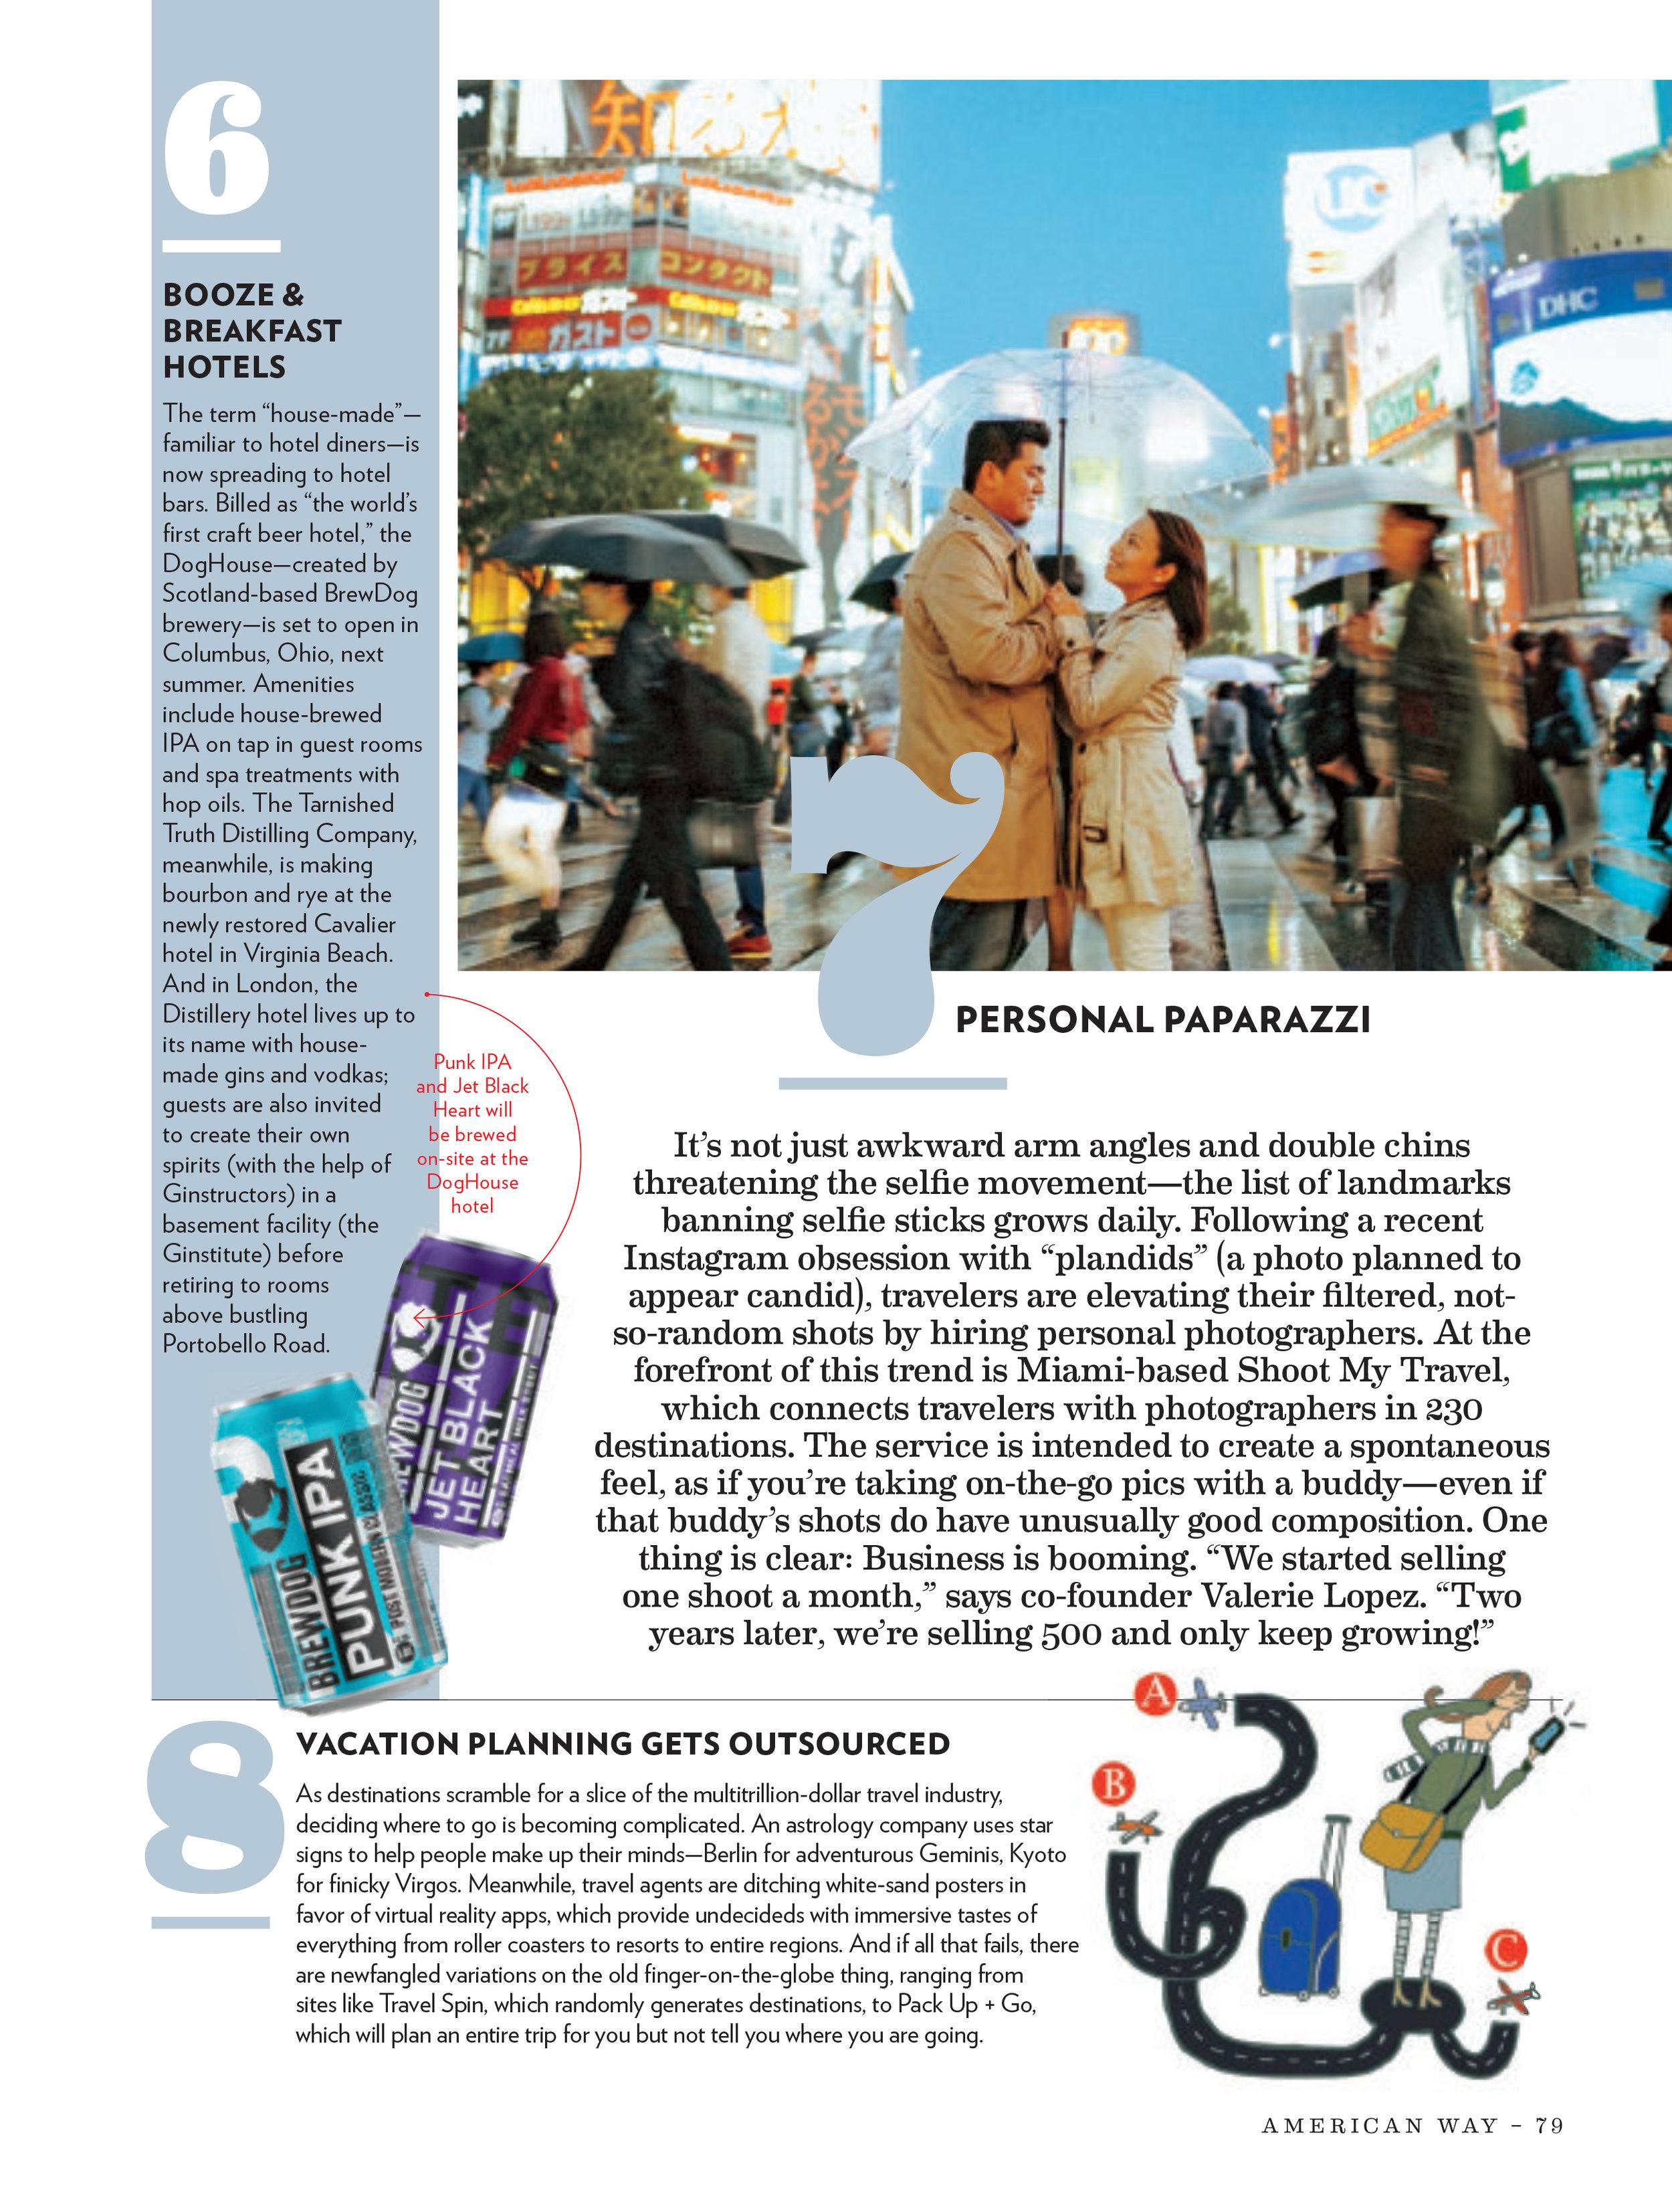 Shoot My Travel American Ways Magazine.jpg